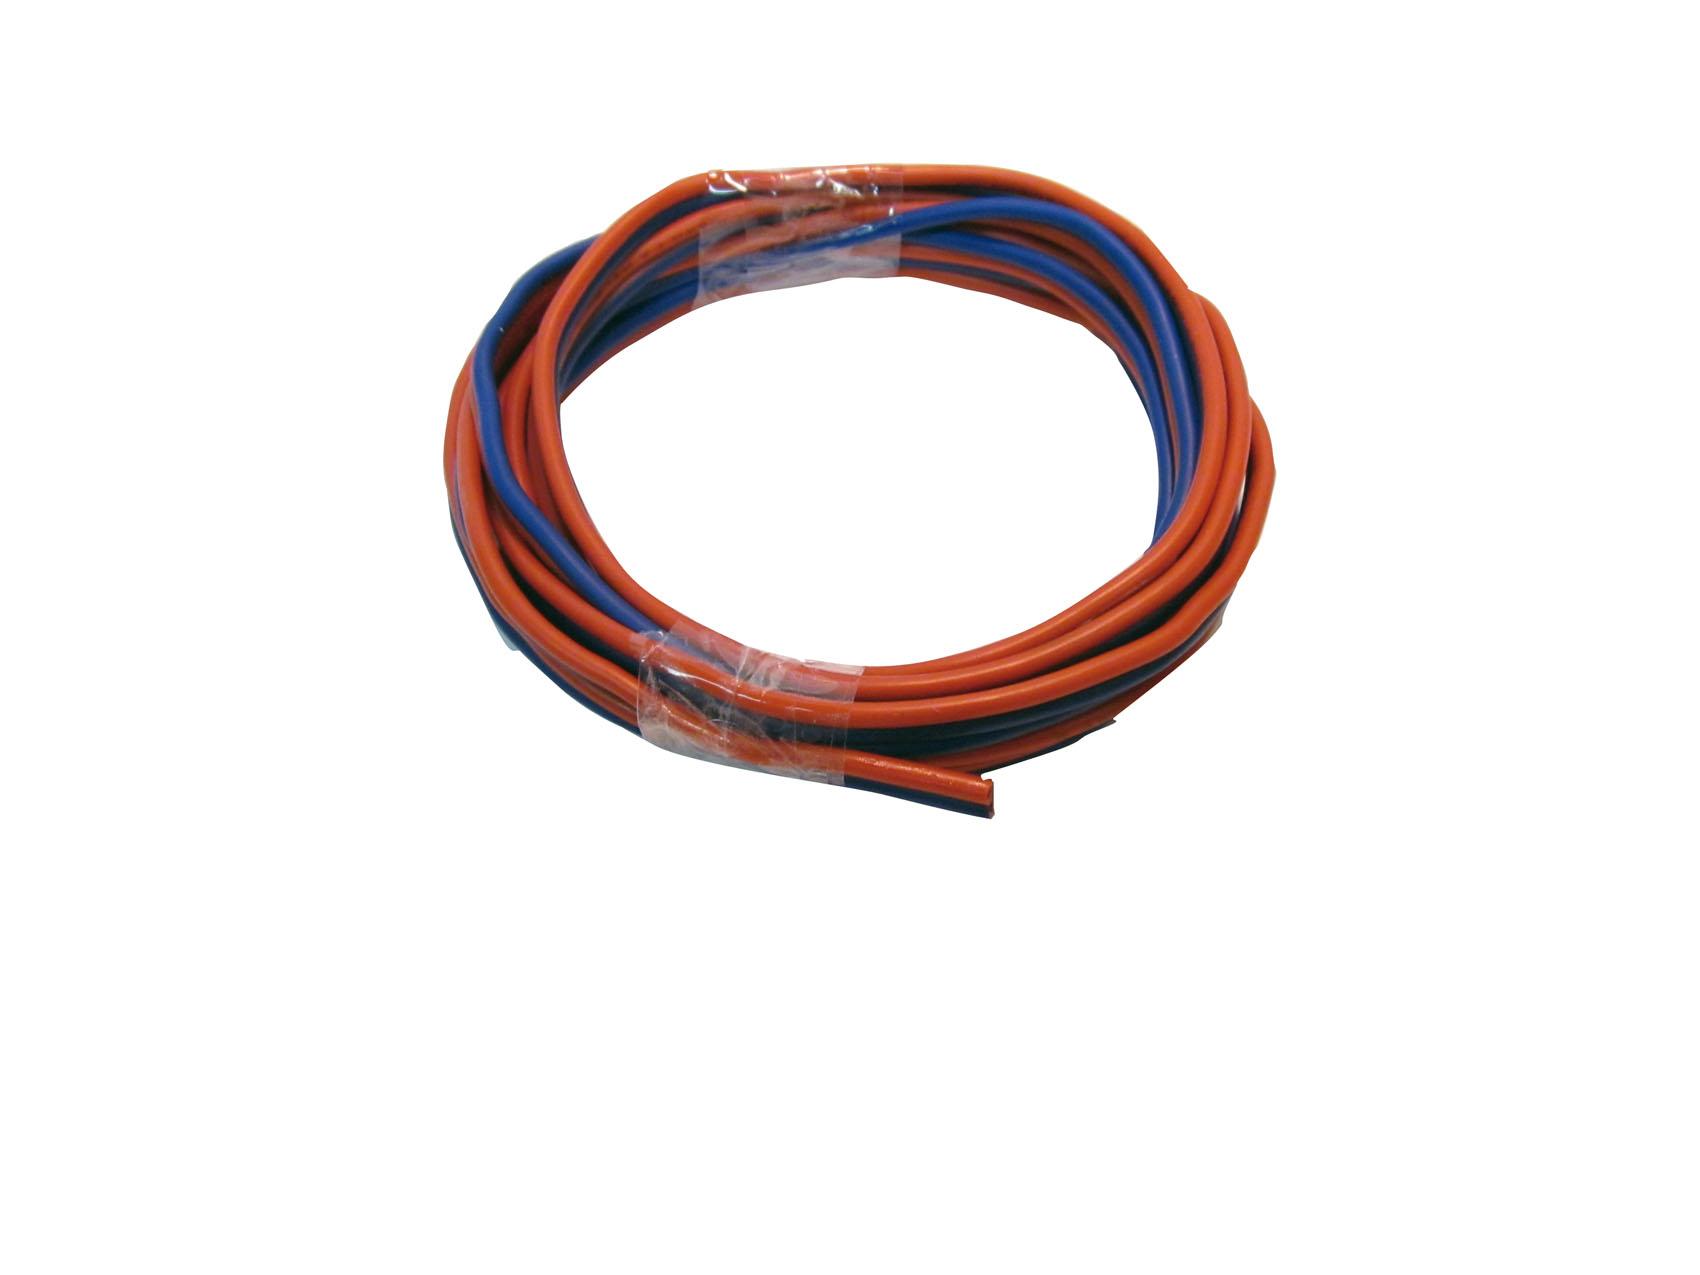 skala kabel verktyg